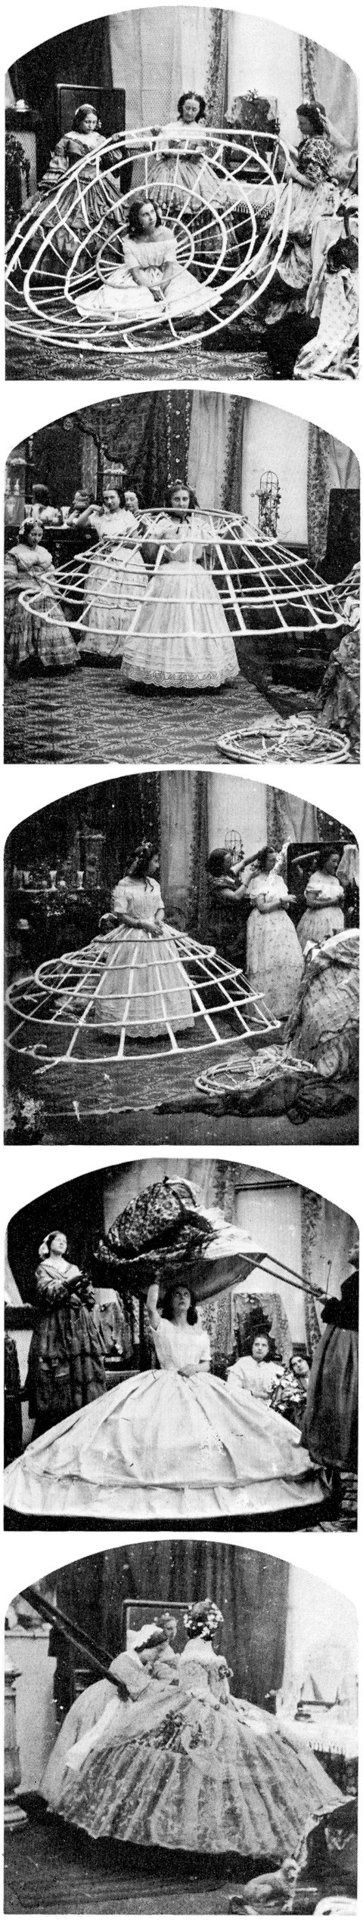 Putting on a Crinoline 1850-1860